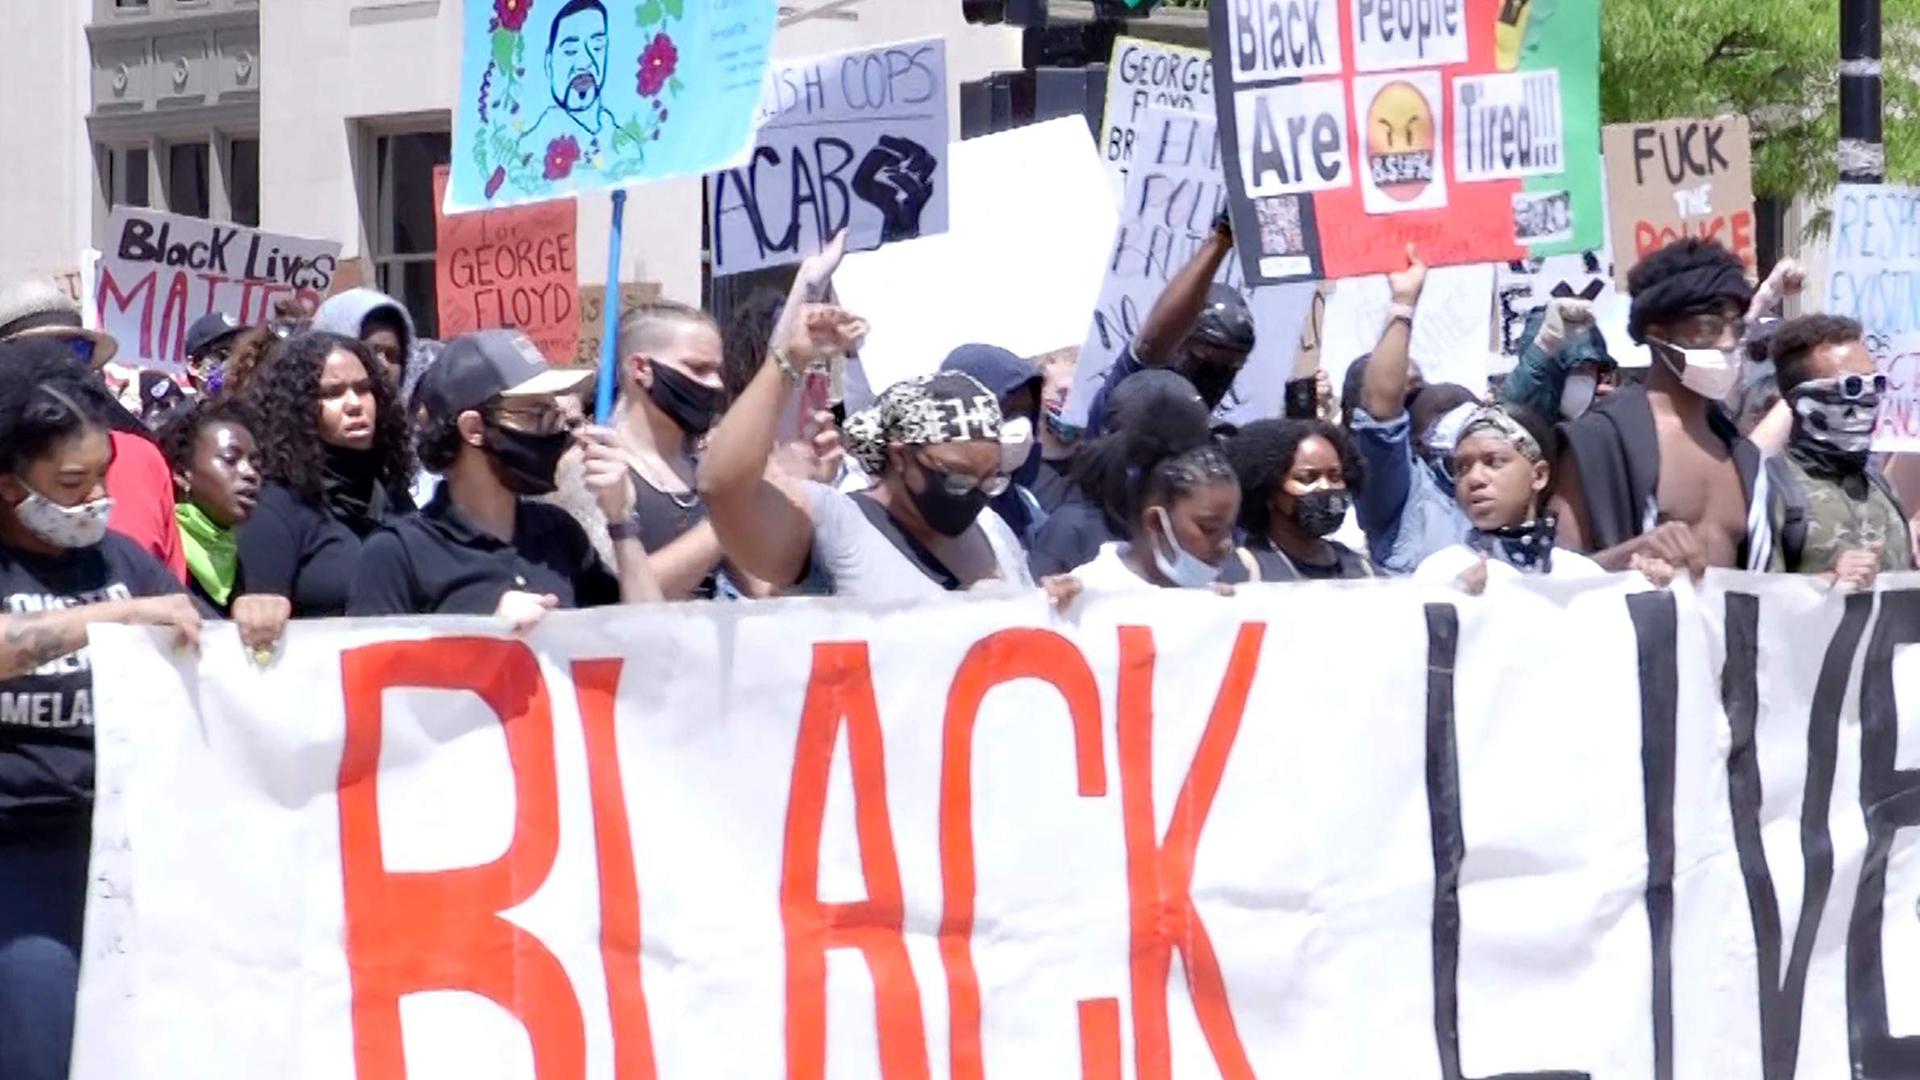 Crowed of protesters holding large Black Lives Matter sign